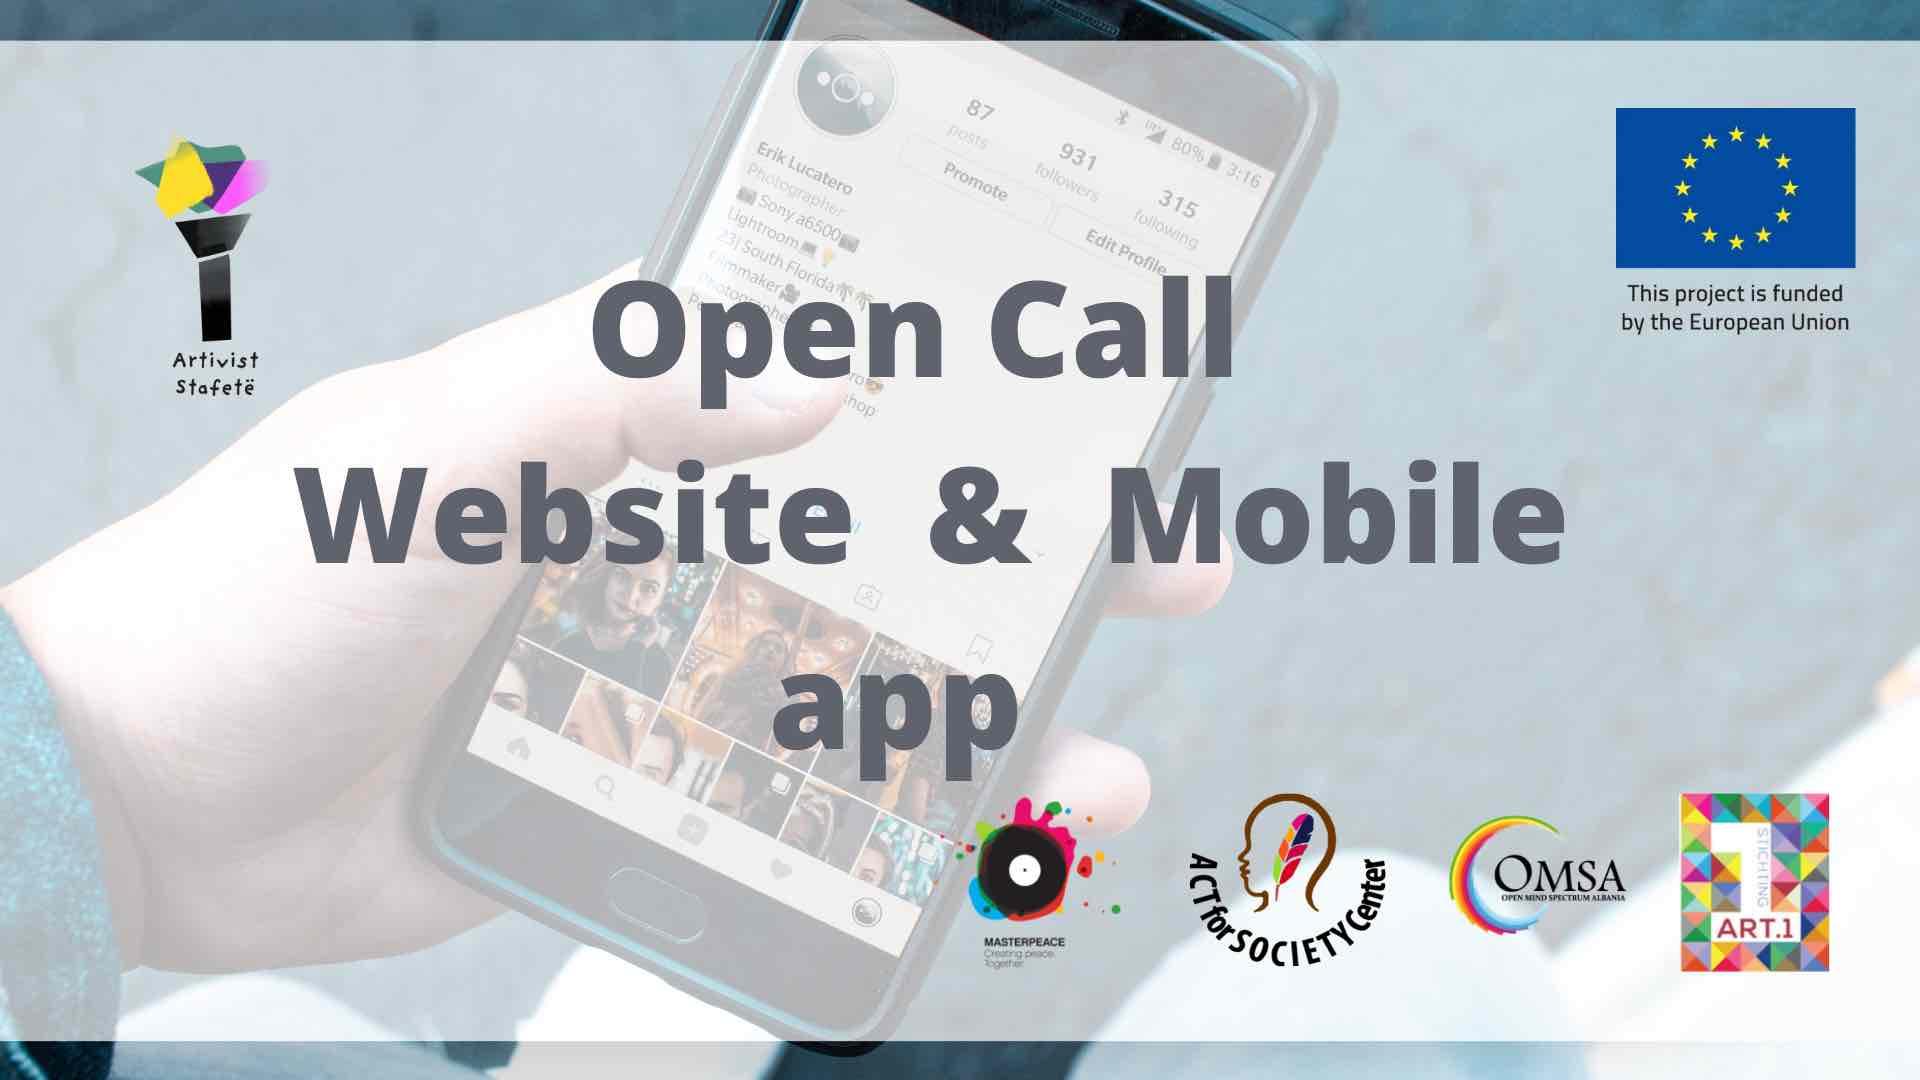 Open Call: Website & Mobile app